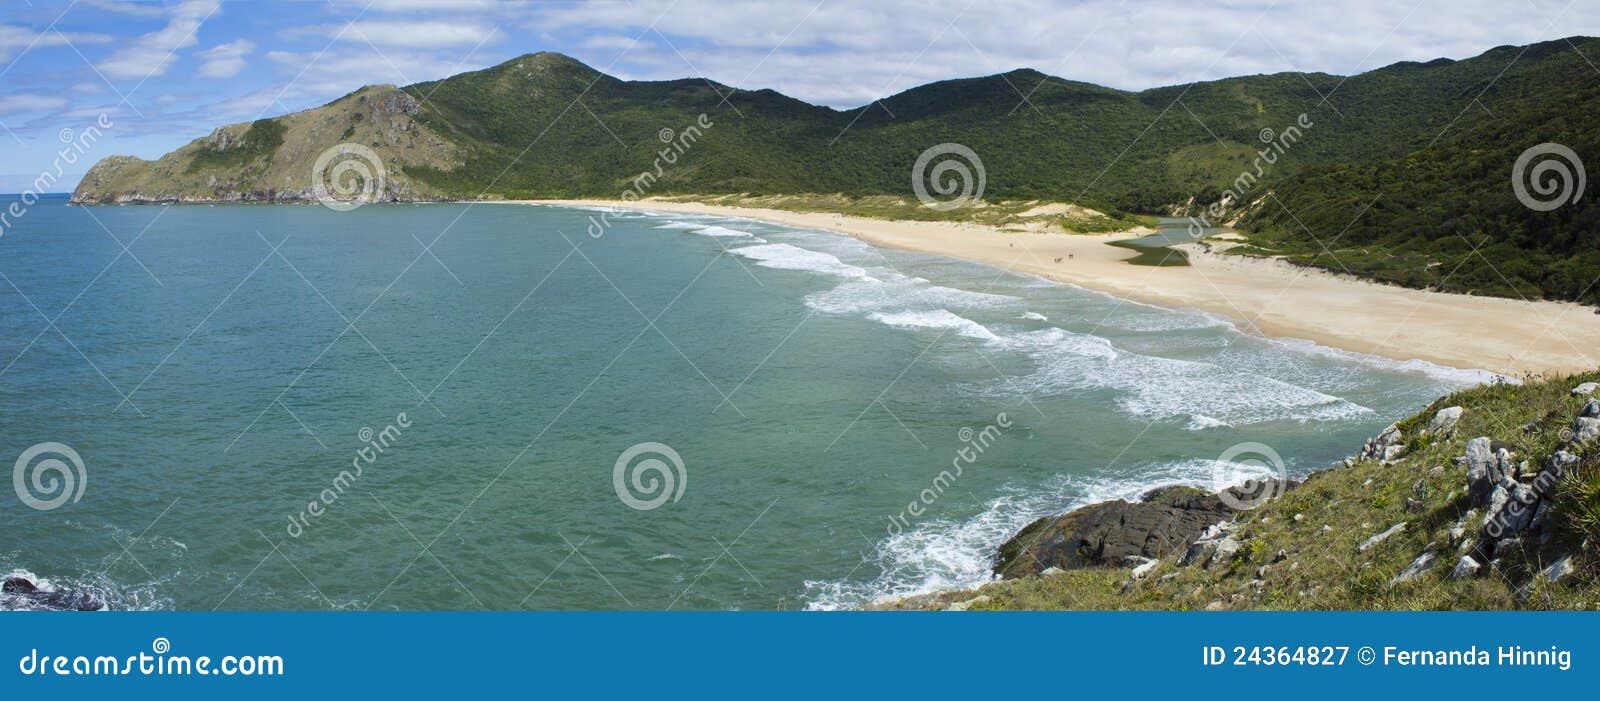 Strand in Florianopolis